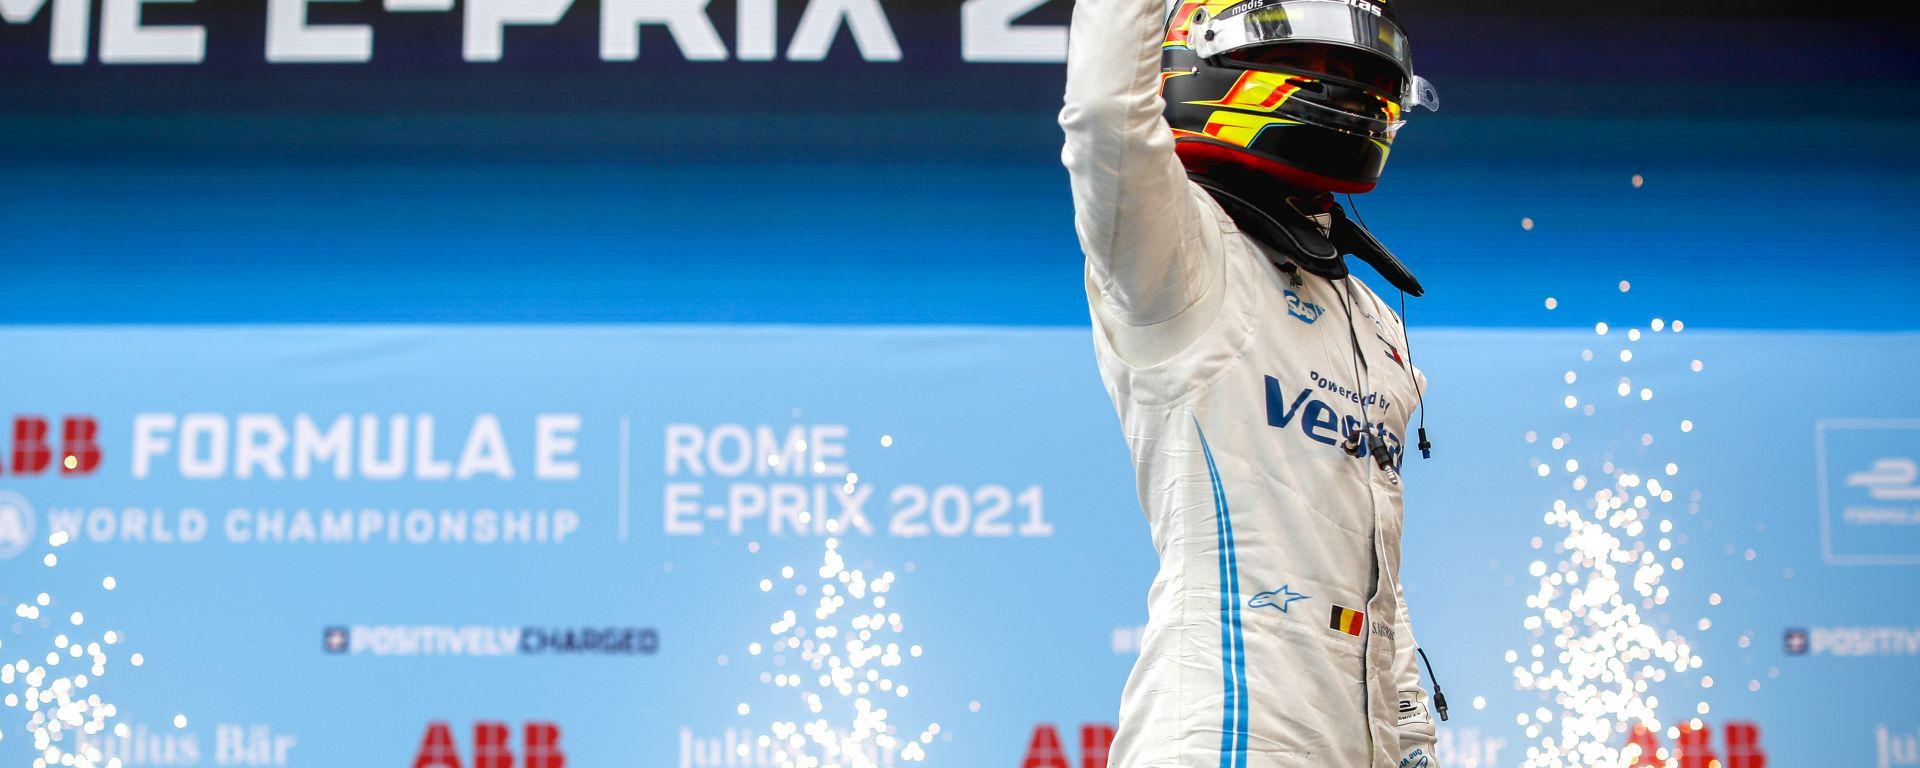 Formula E ePrix Roma 2021: Stoffel Vandoorne (Mercedes EQ) esulta dopo il traguardo